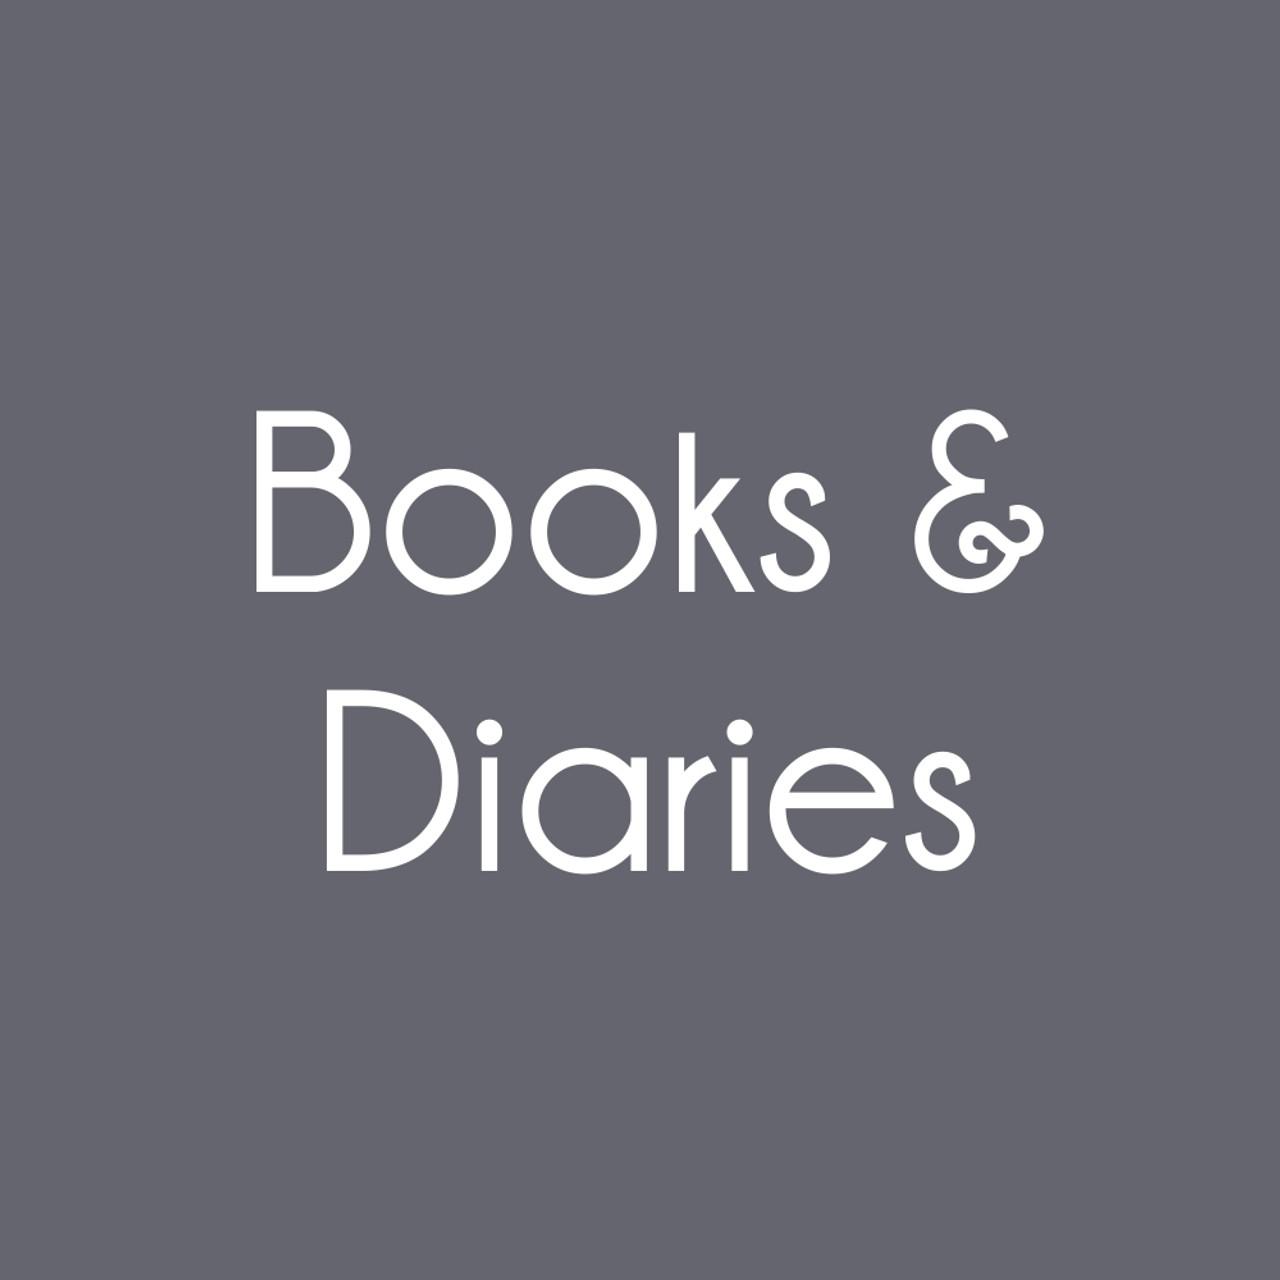 Books & Diaries